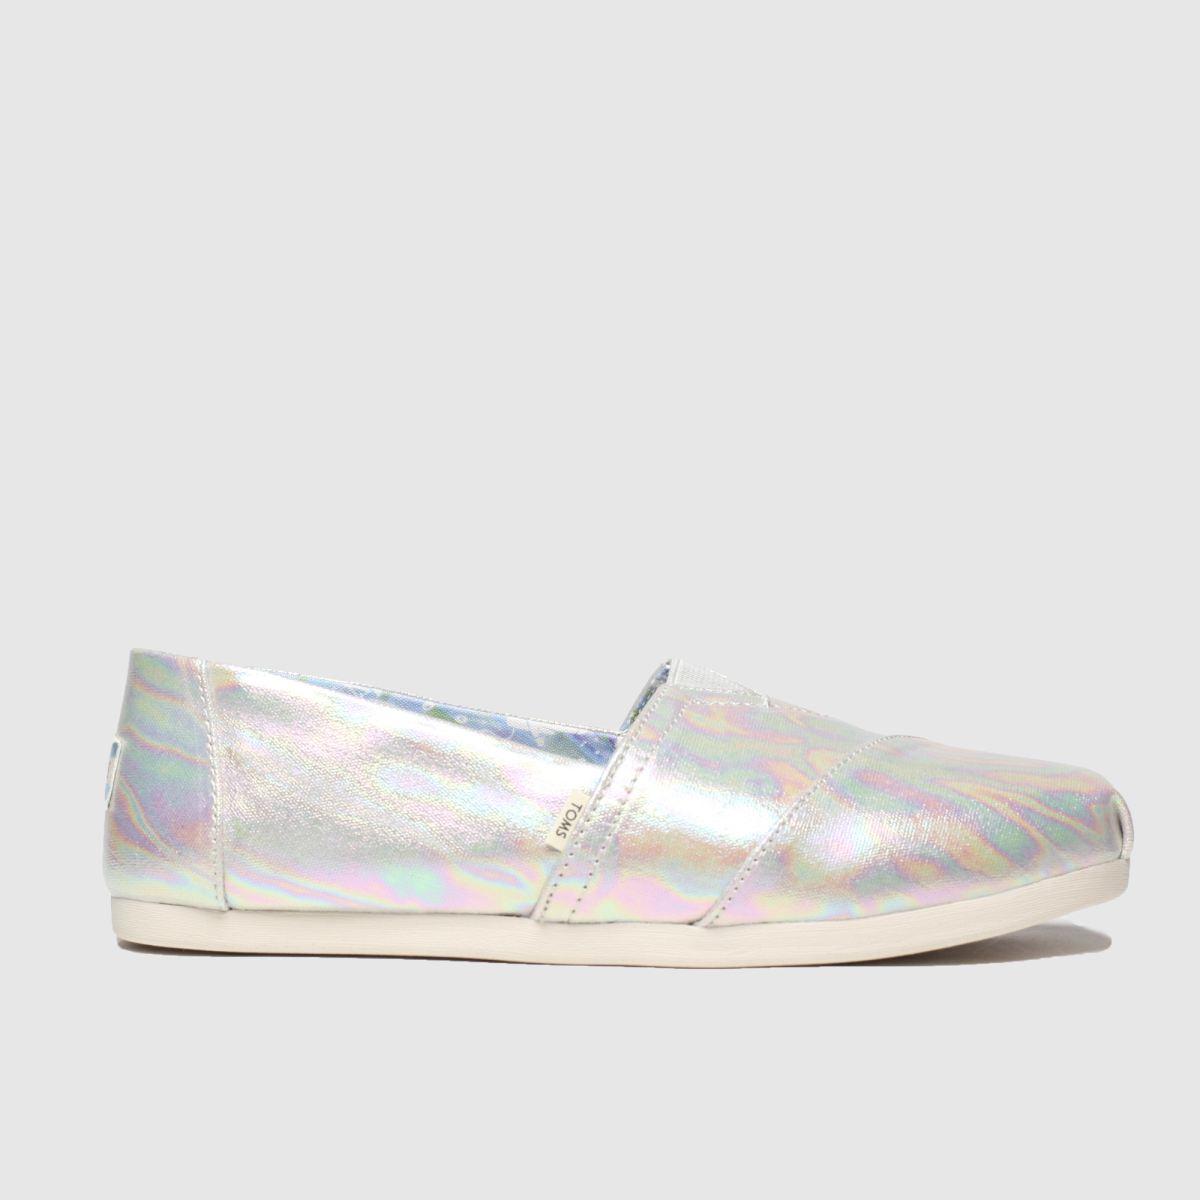 Toms Silver Alpargata 3.0 Metallic Flat Shoes